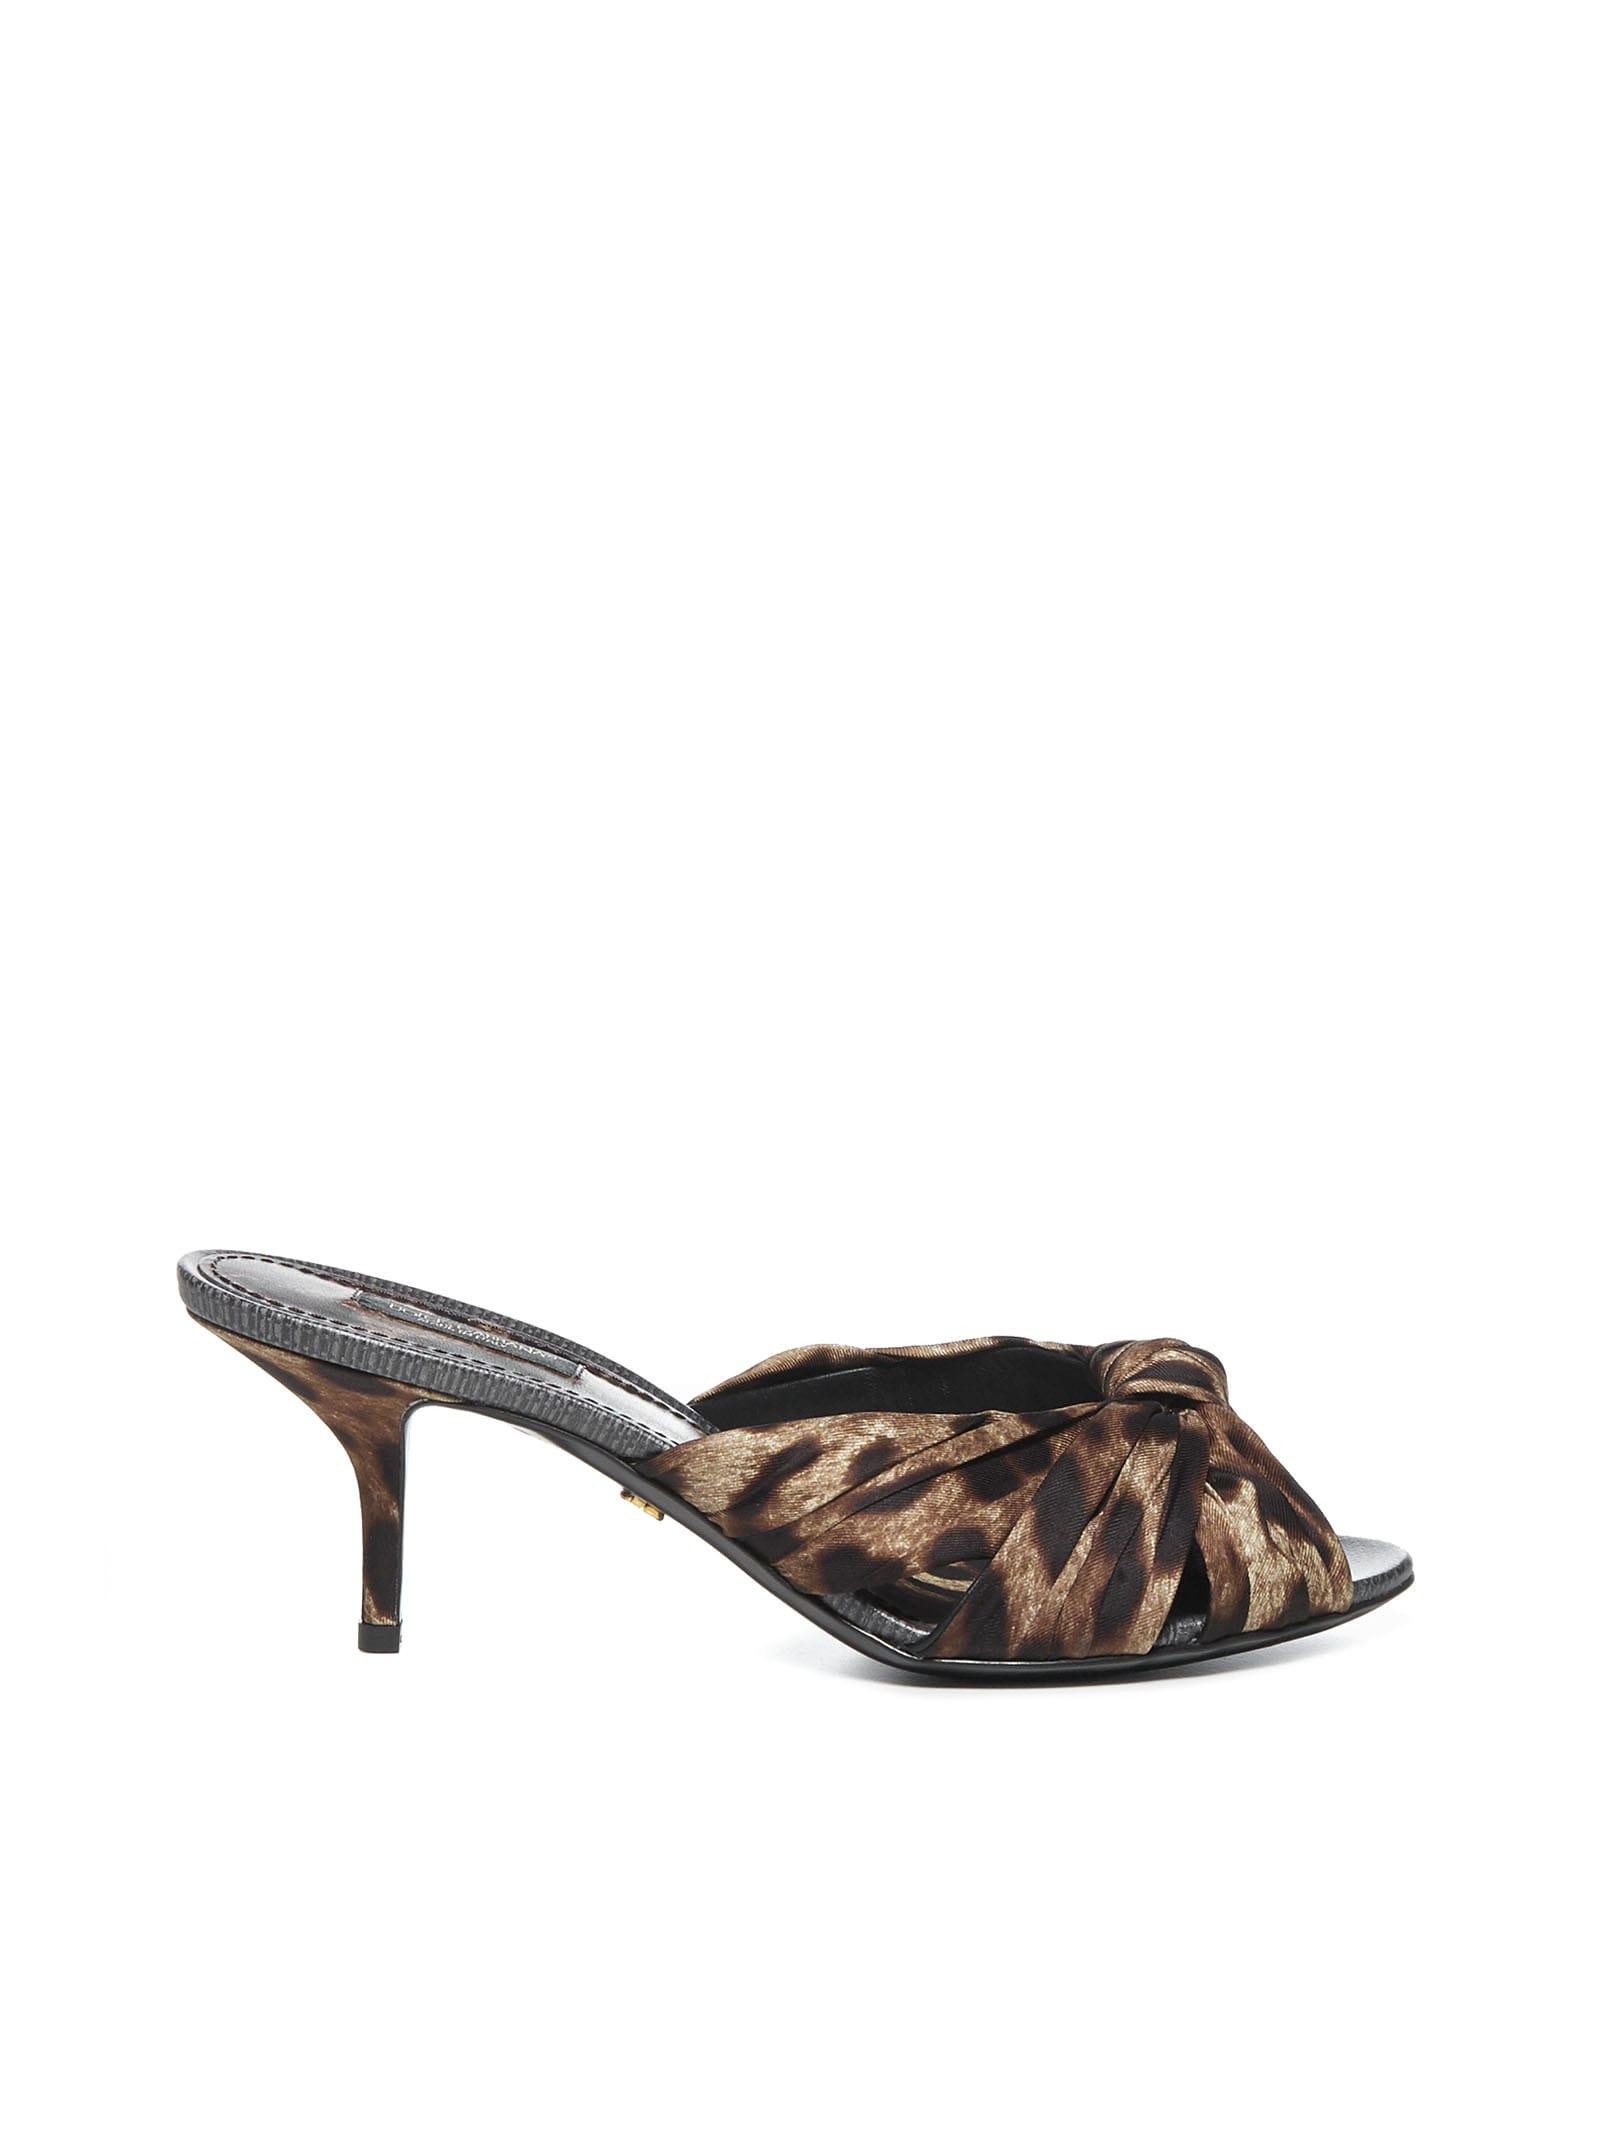 Dolce & Gabbana Leopard Printed Flat Shoes